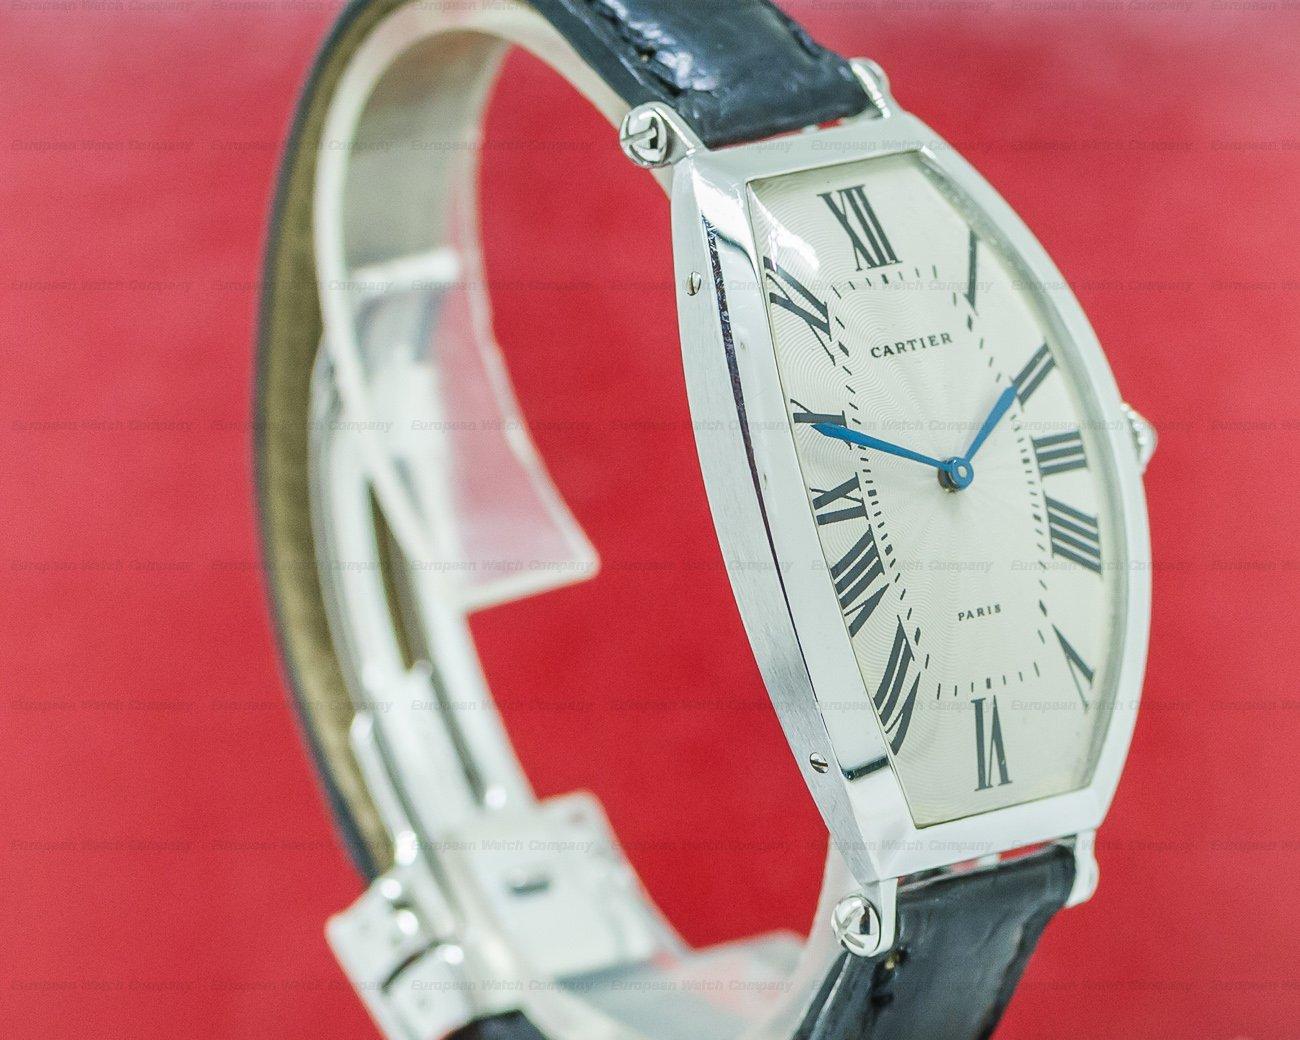 Cartier 2435 Platinum Tonneau Cintree Manual Wind 1990s RARE